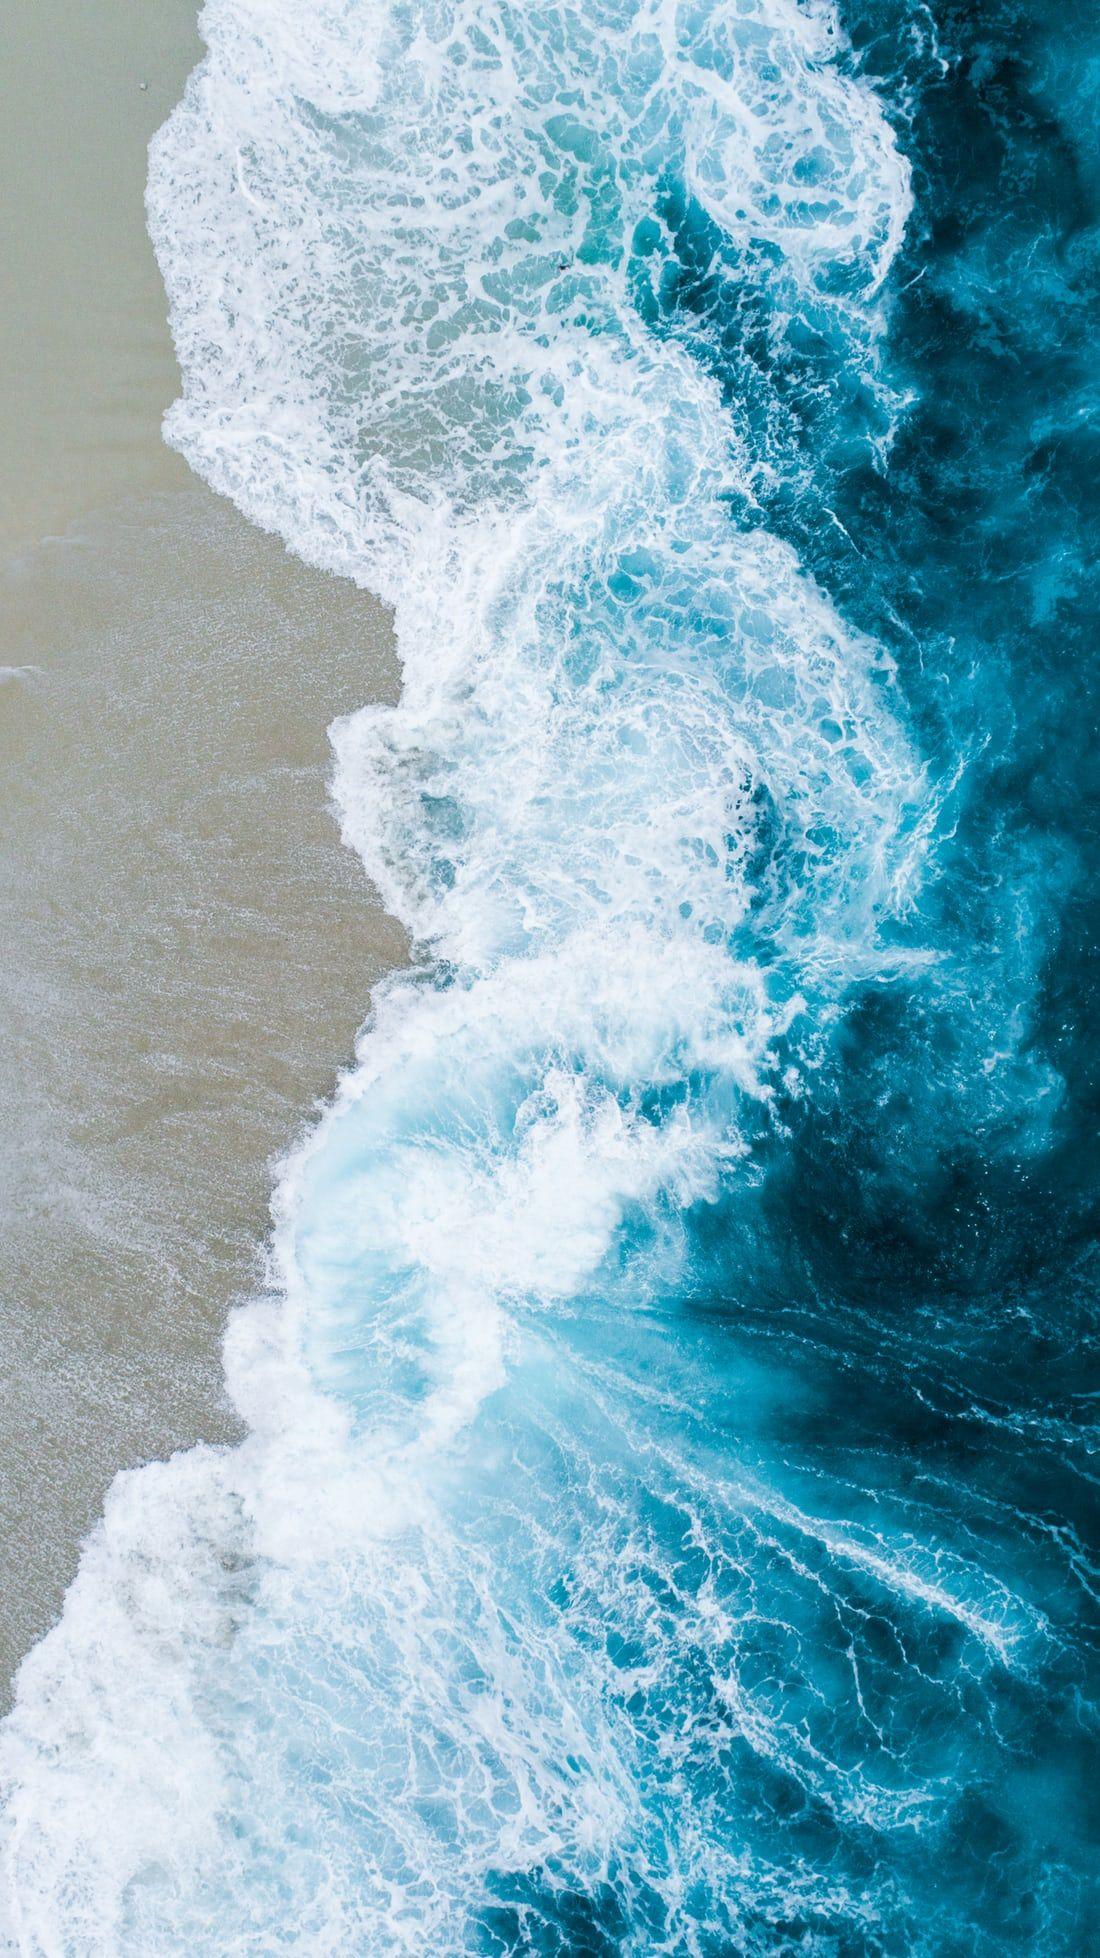 Body Of Water On Beach Shore Blue Wallpaper Iphone Ocean Wallpaper Waves Wallpaper